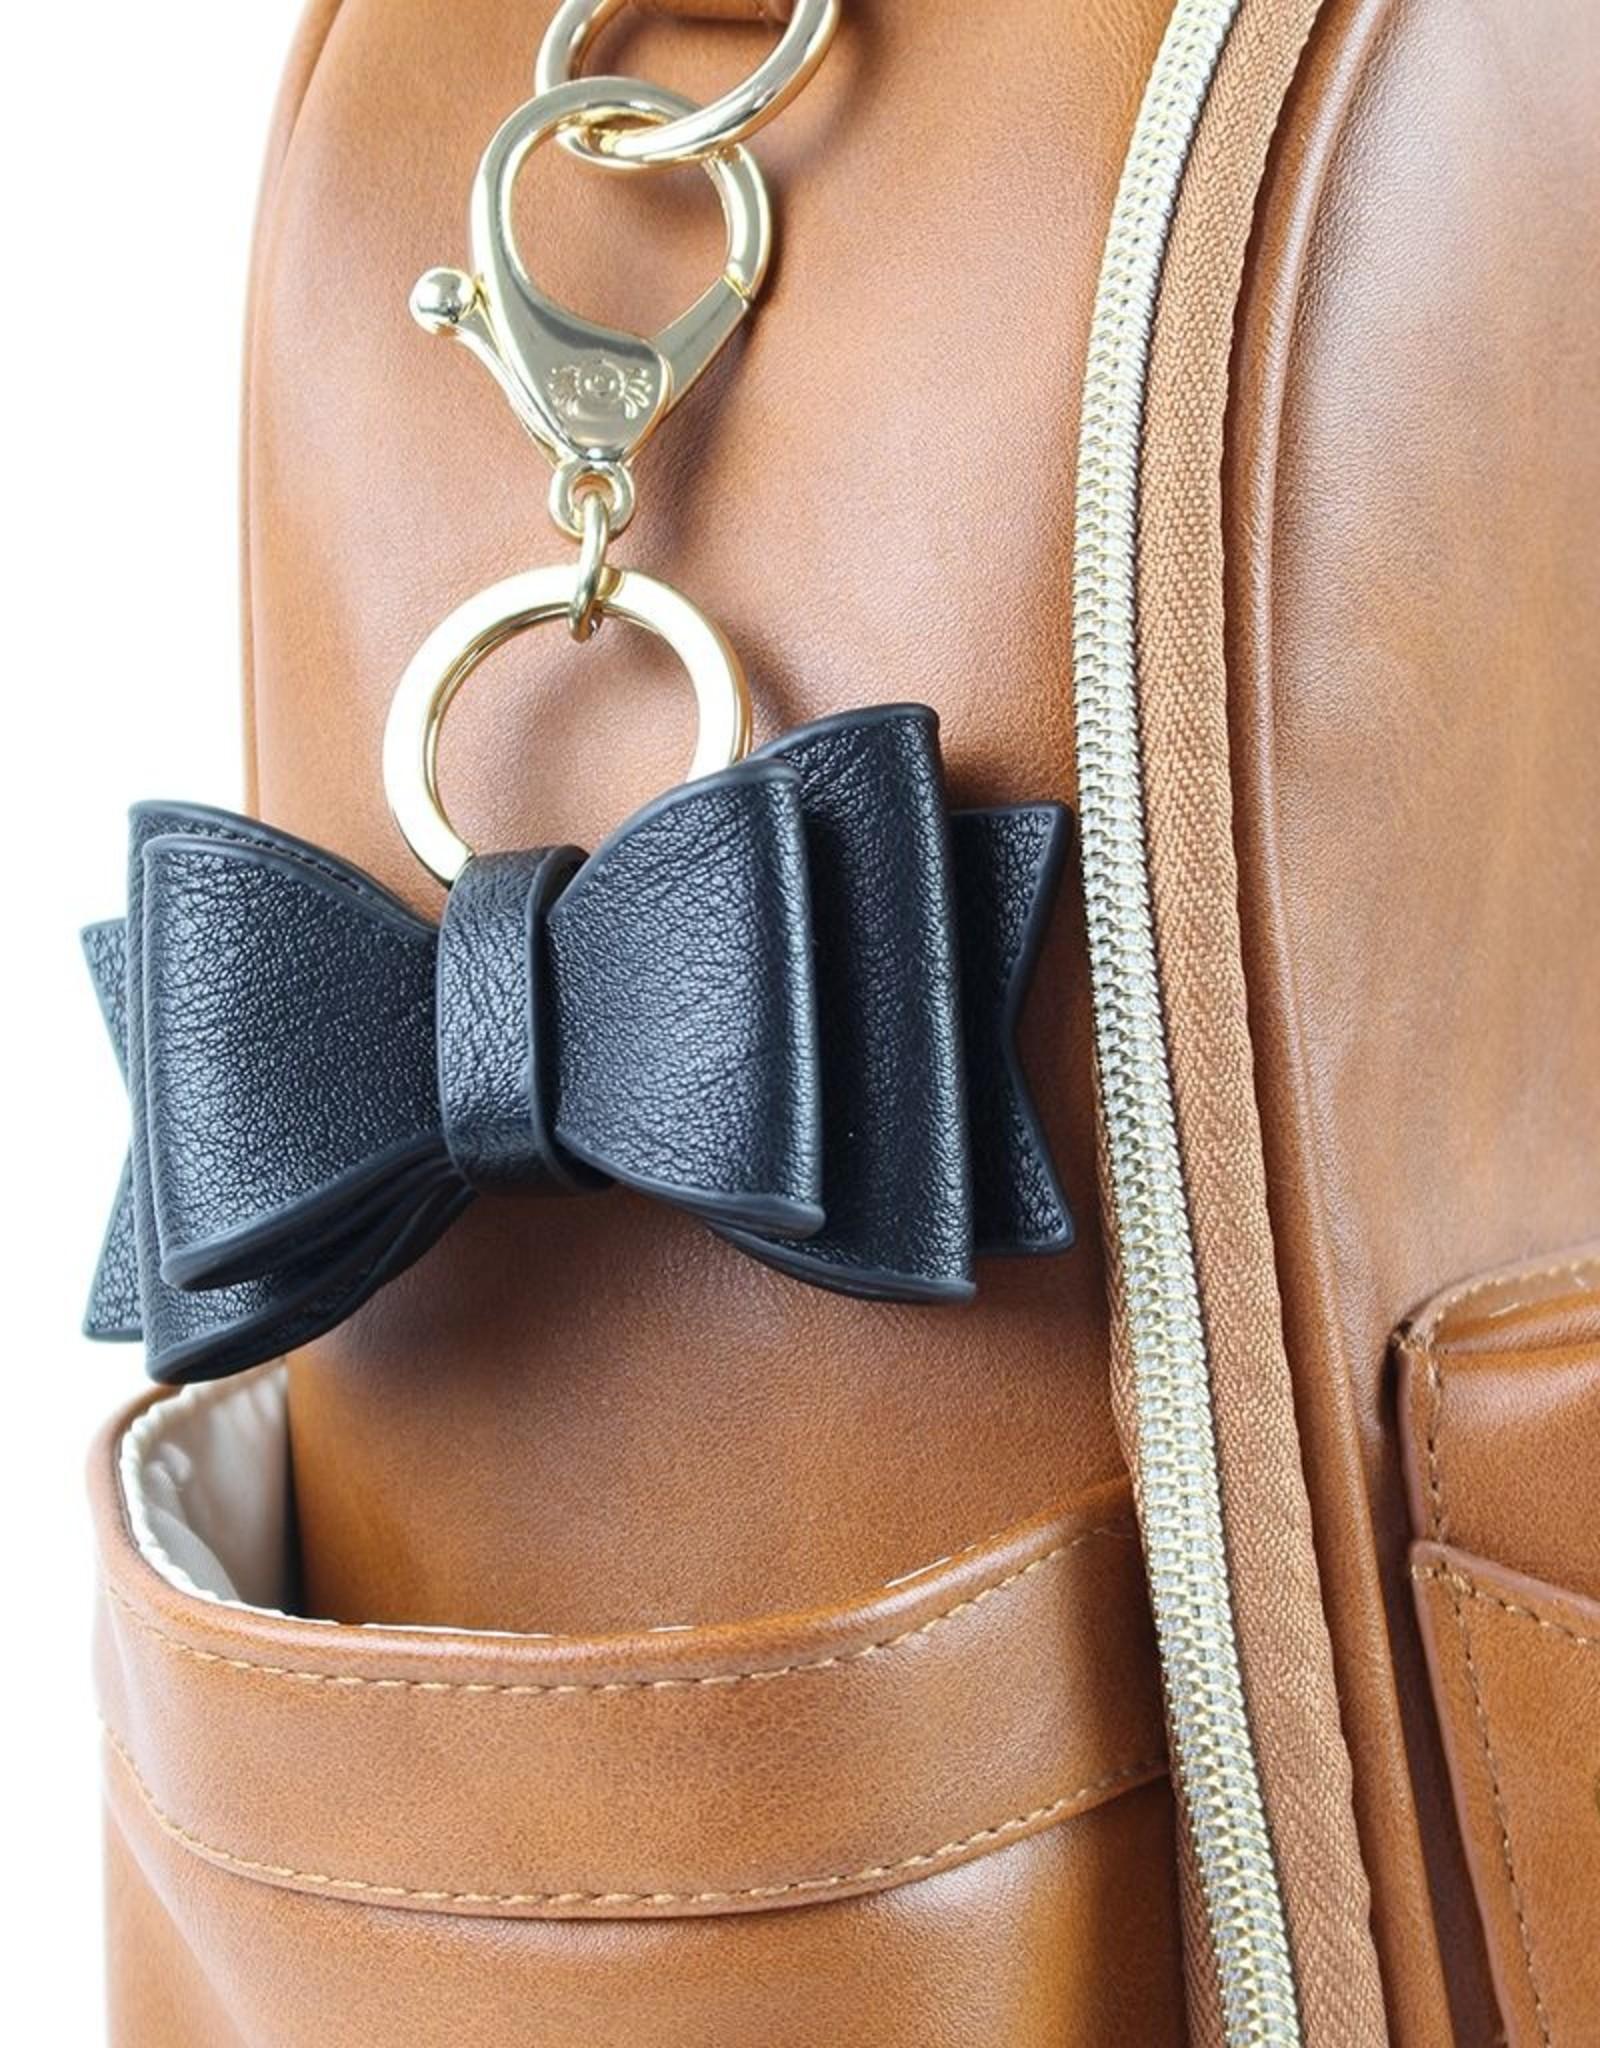 Itzy Ritzy Boss Bow Keychain Charm